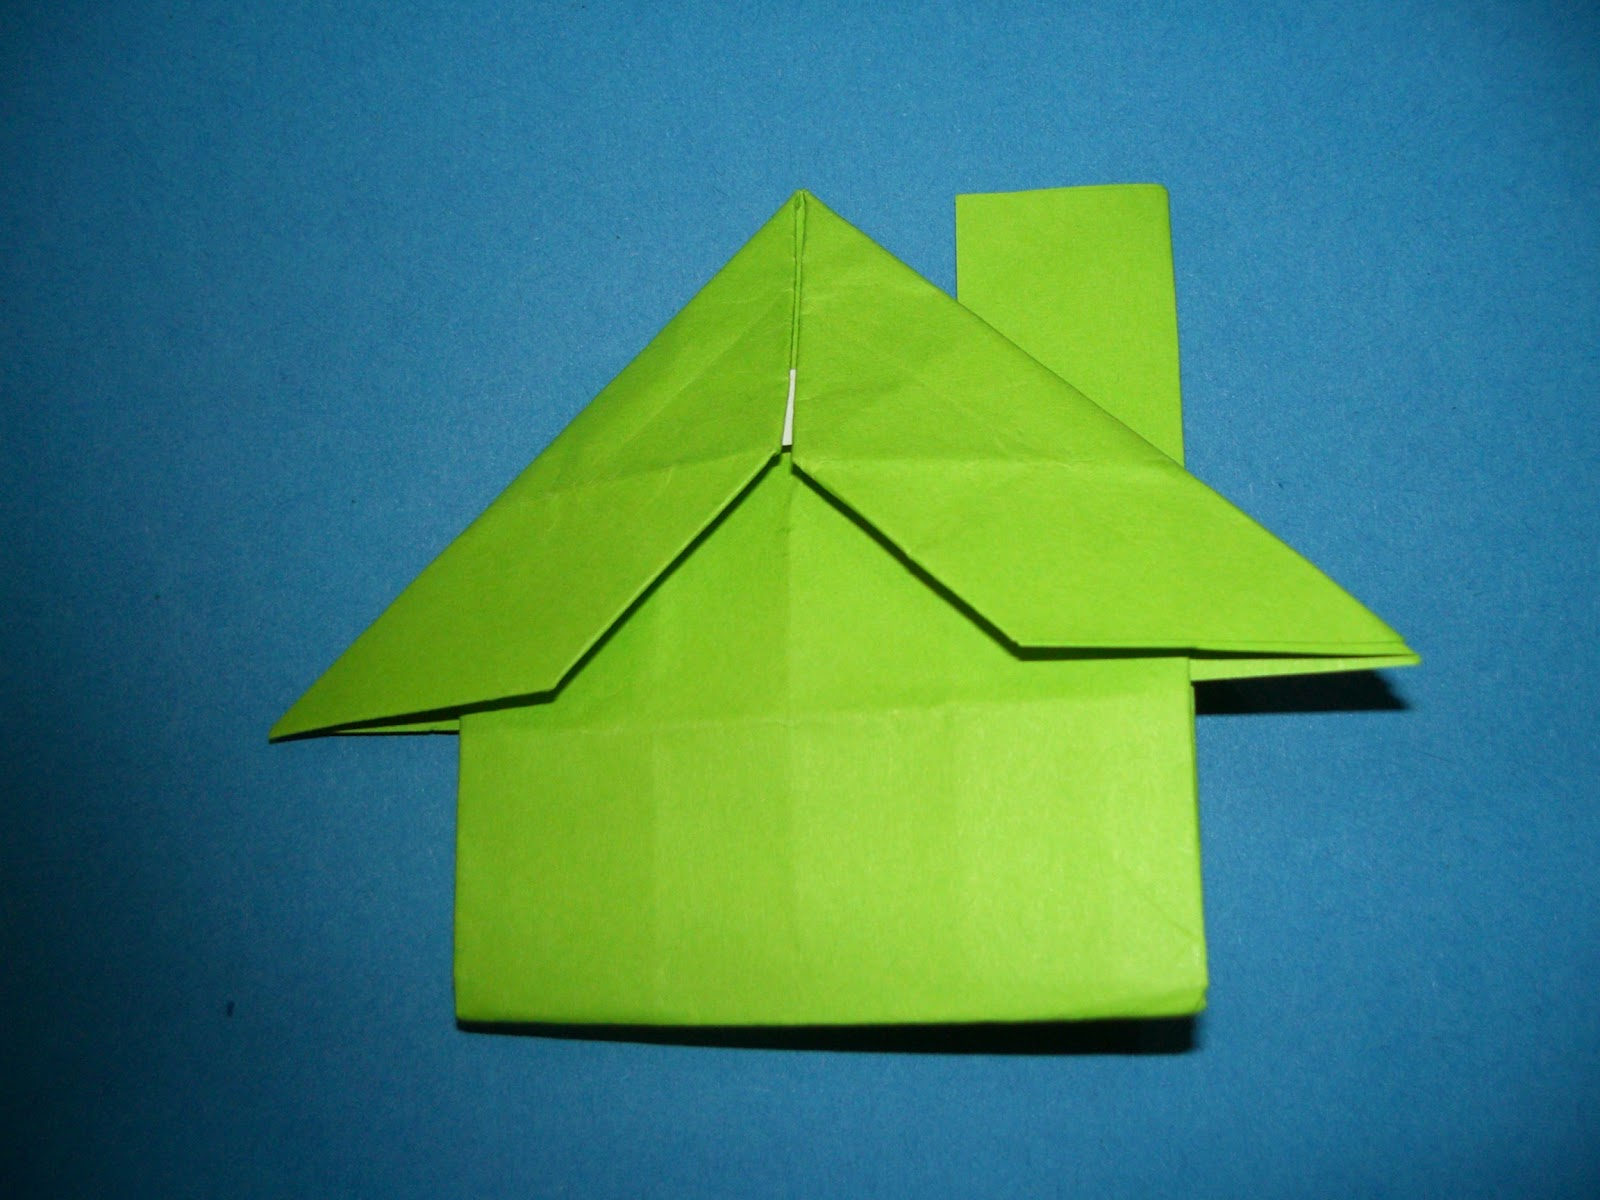 les droits des gones r aliser la maison n 2. Black Bedroom Furniture Sets. Home Design Ideas